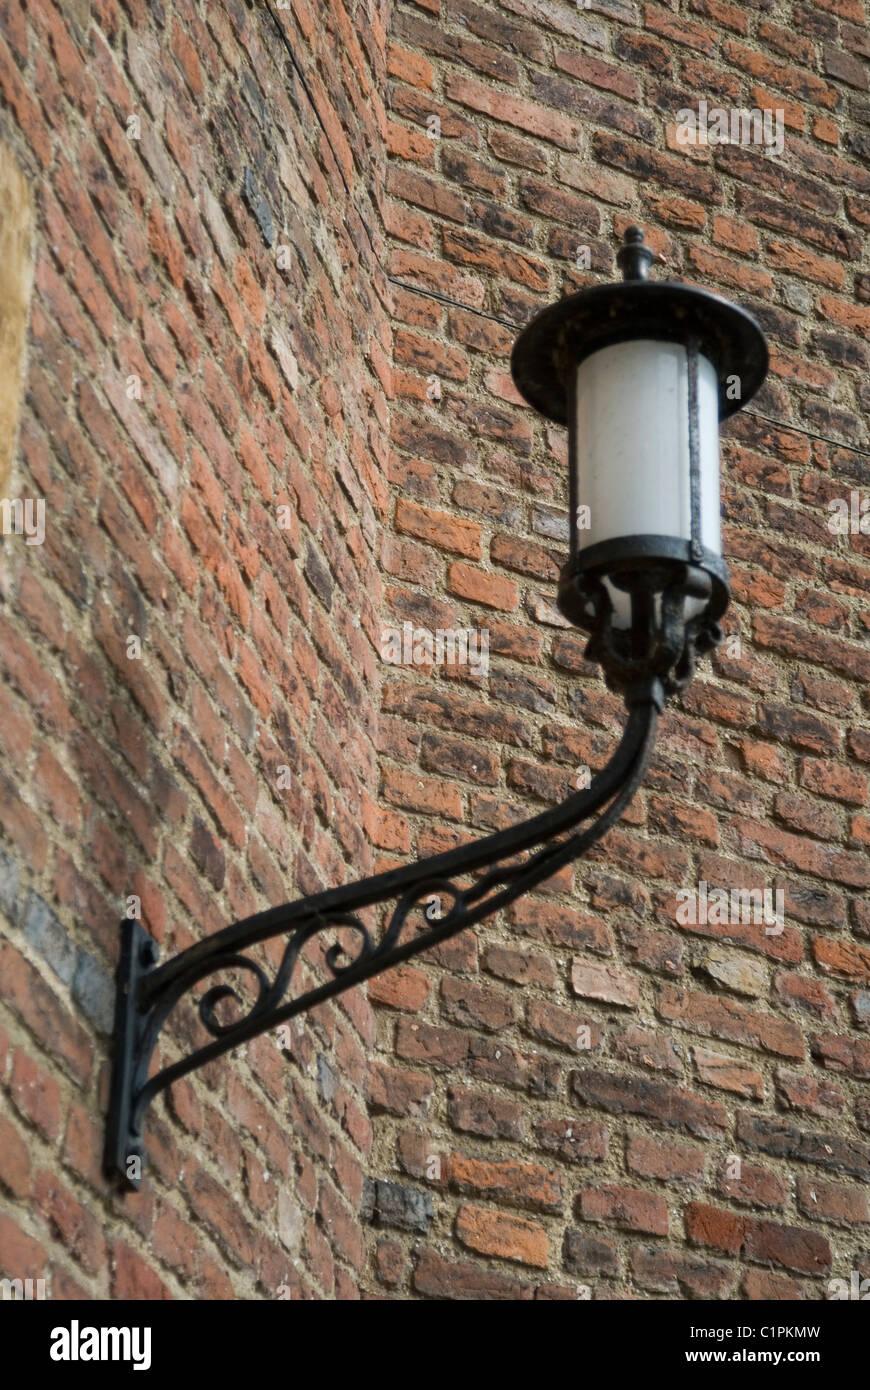 Inglaterra, Cambridge, lámpara de pared de ladrillo Imagen De Stock